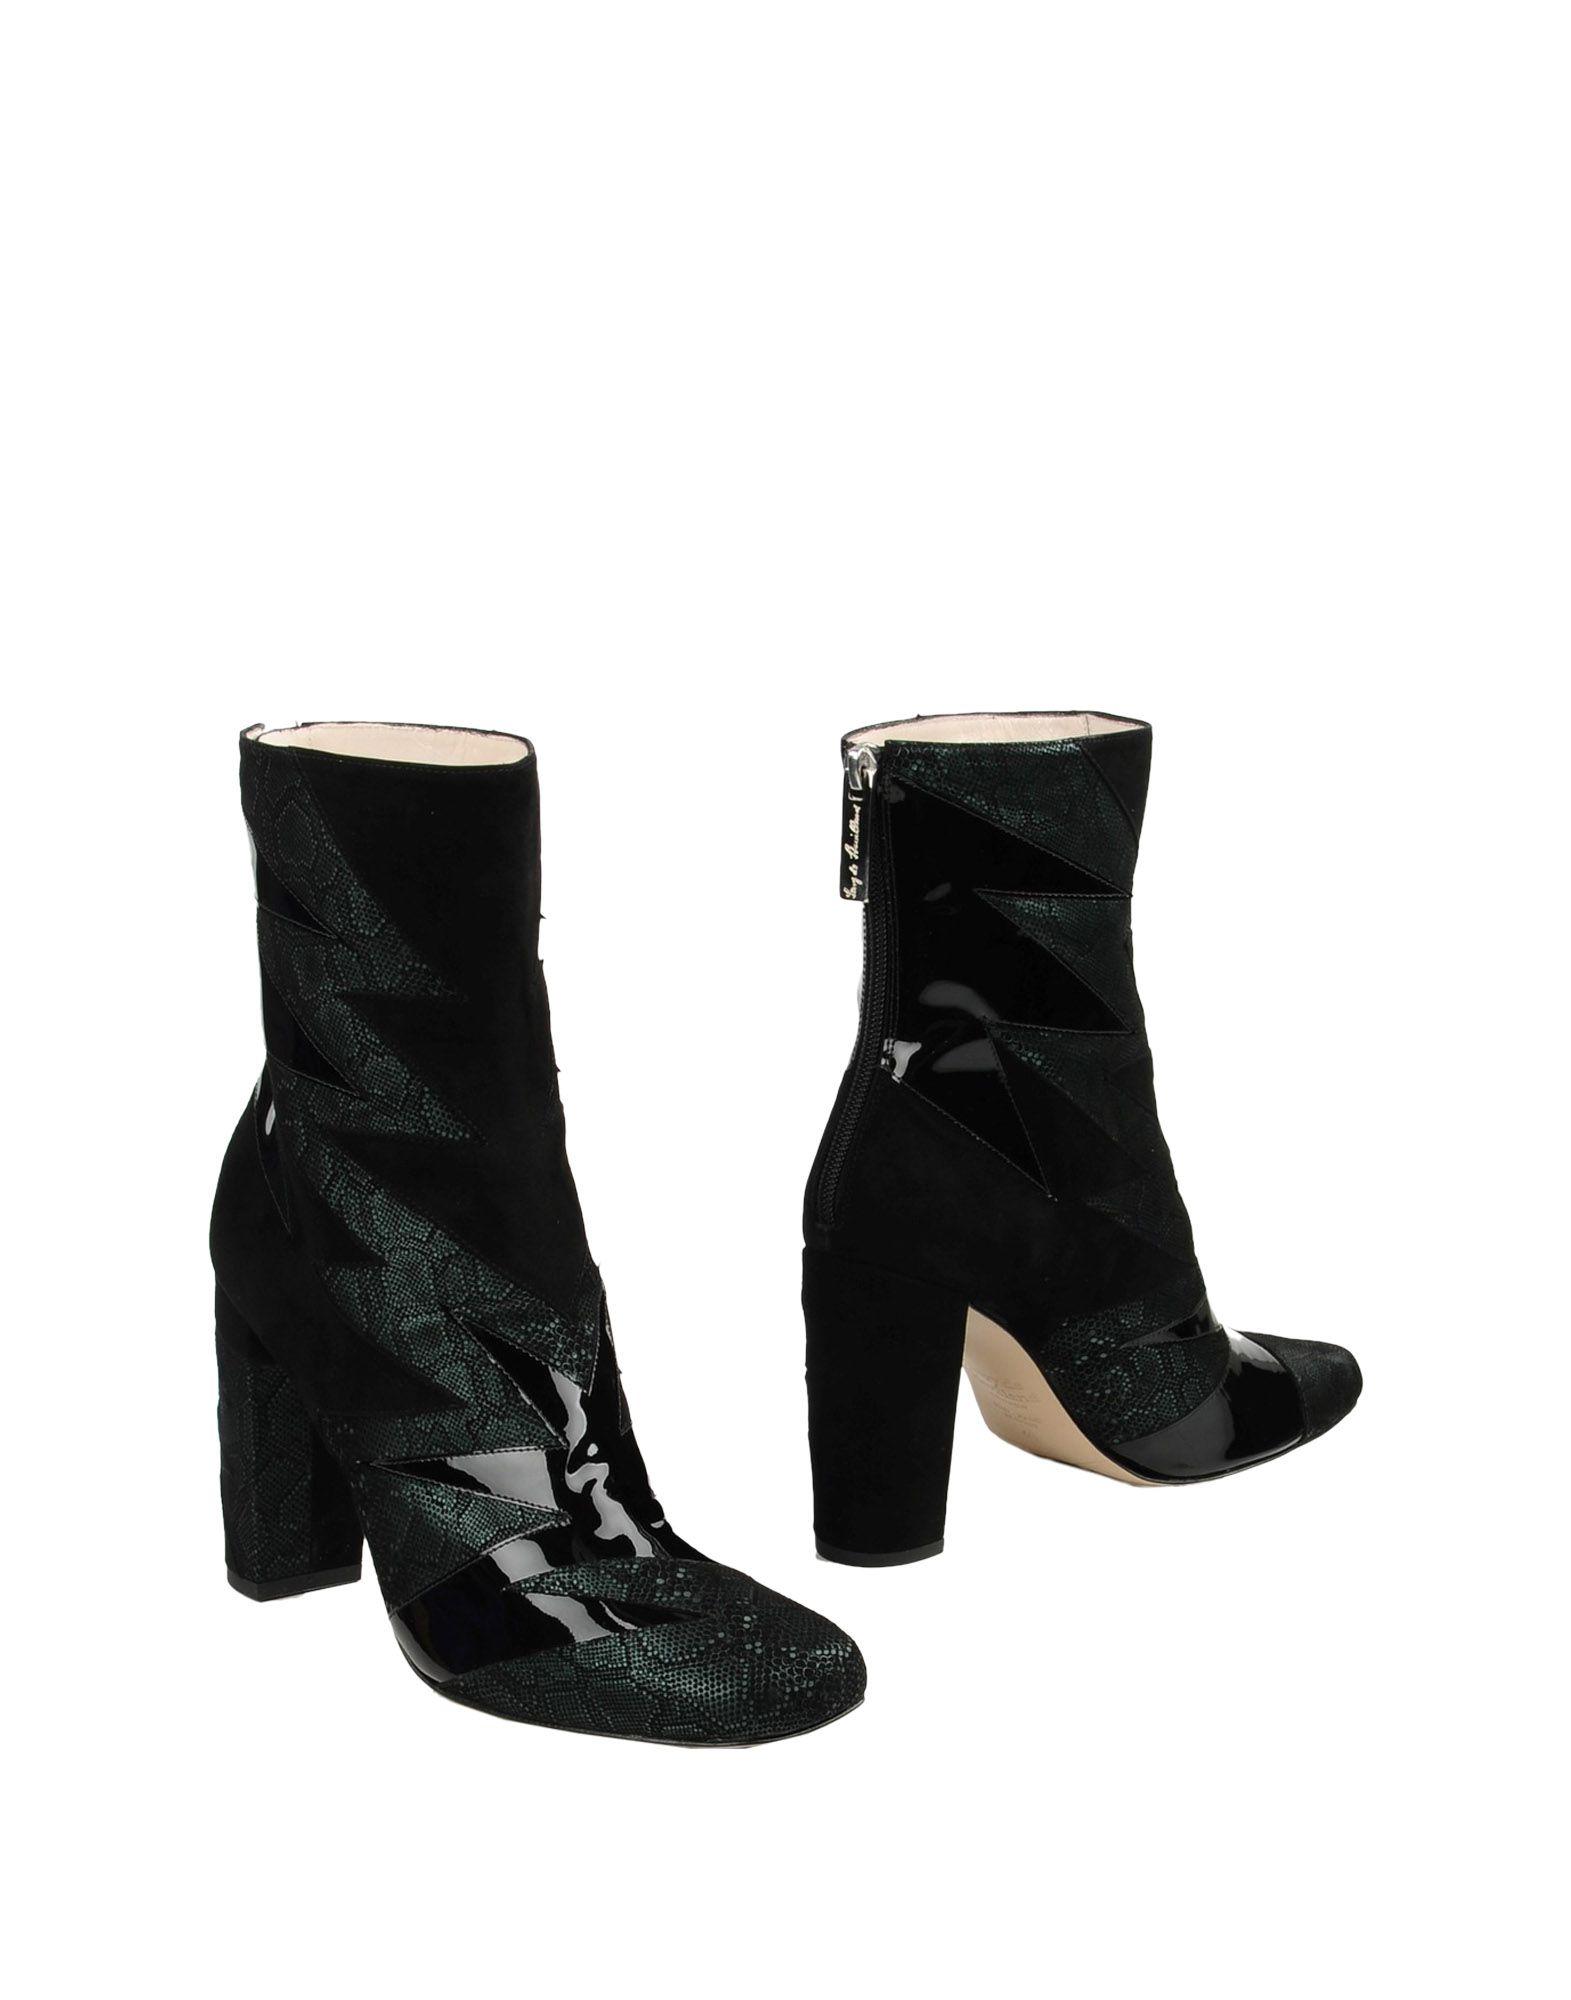 TERRY DE HAVILLAND Полусапоги и высокие ботинки d s de полусапоги и высокие ботинки